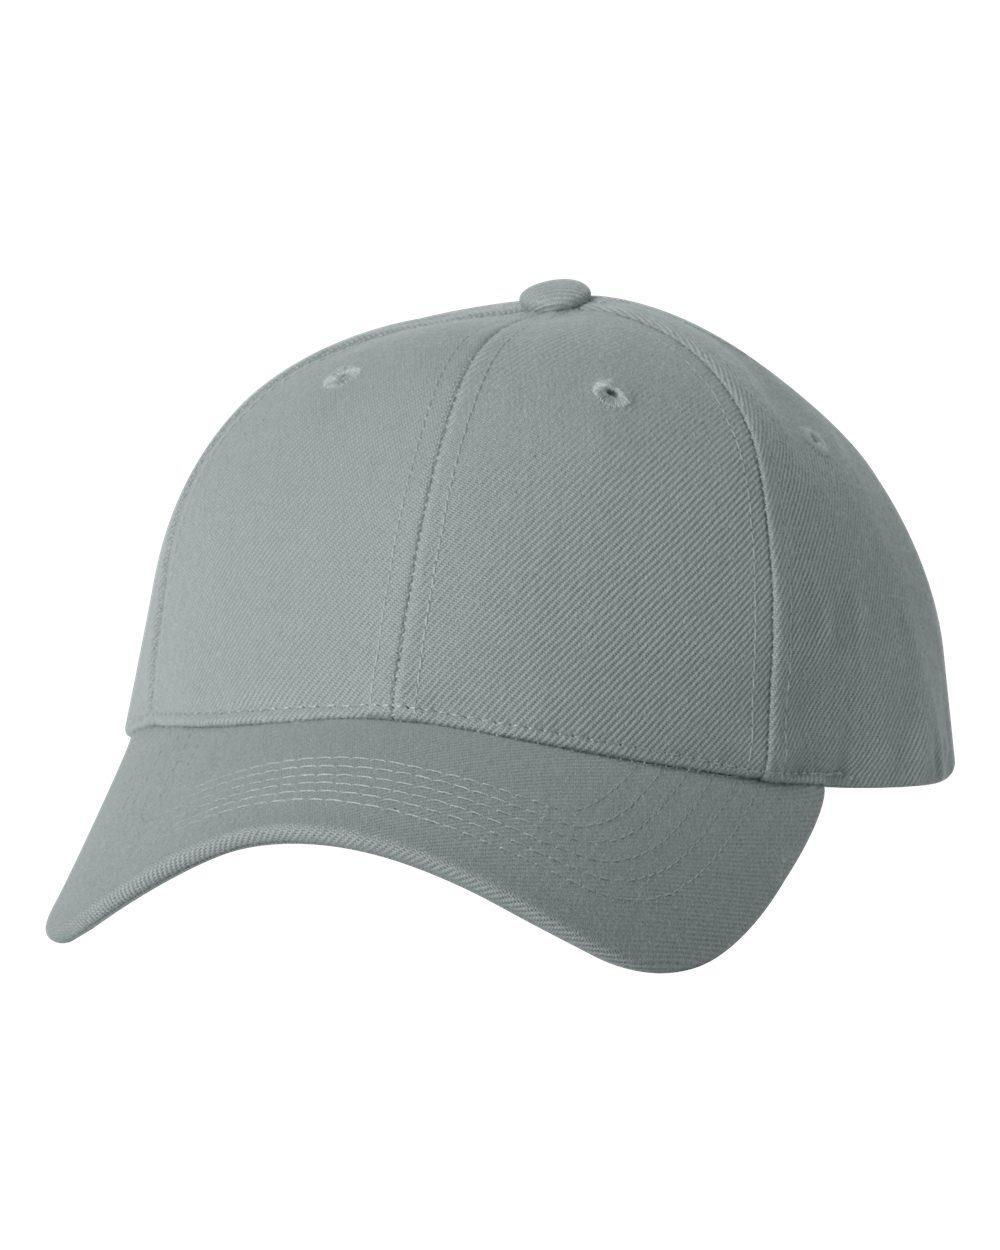 Sportsman 2220 - Wool-Blend Cap